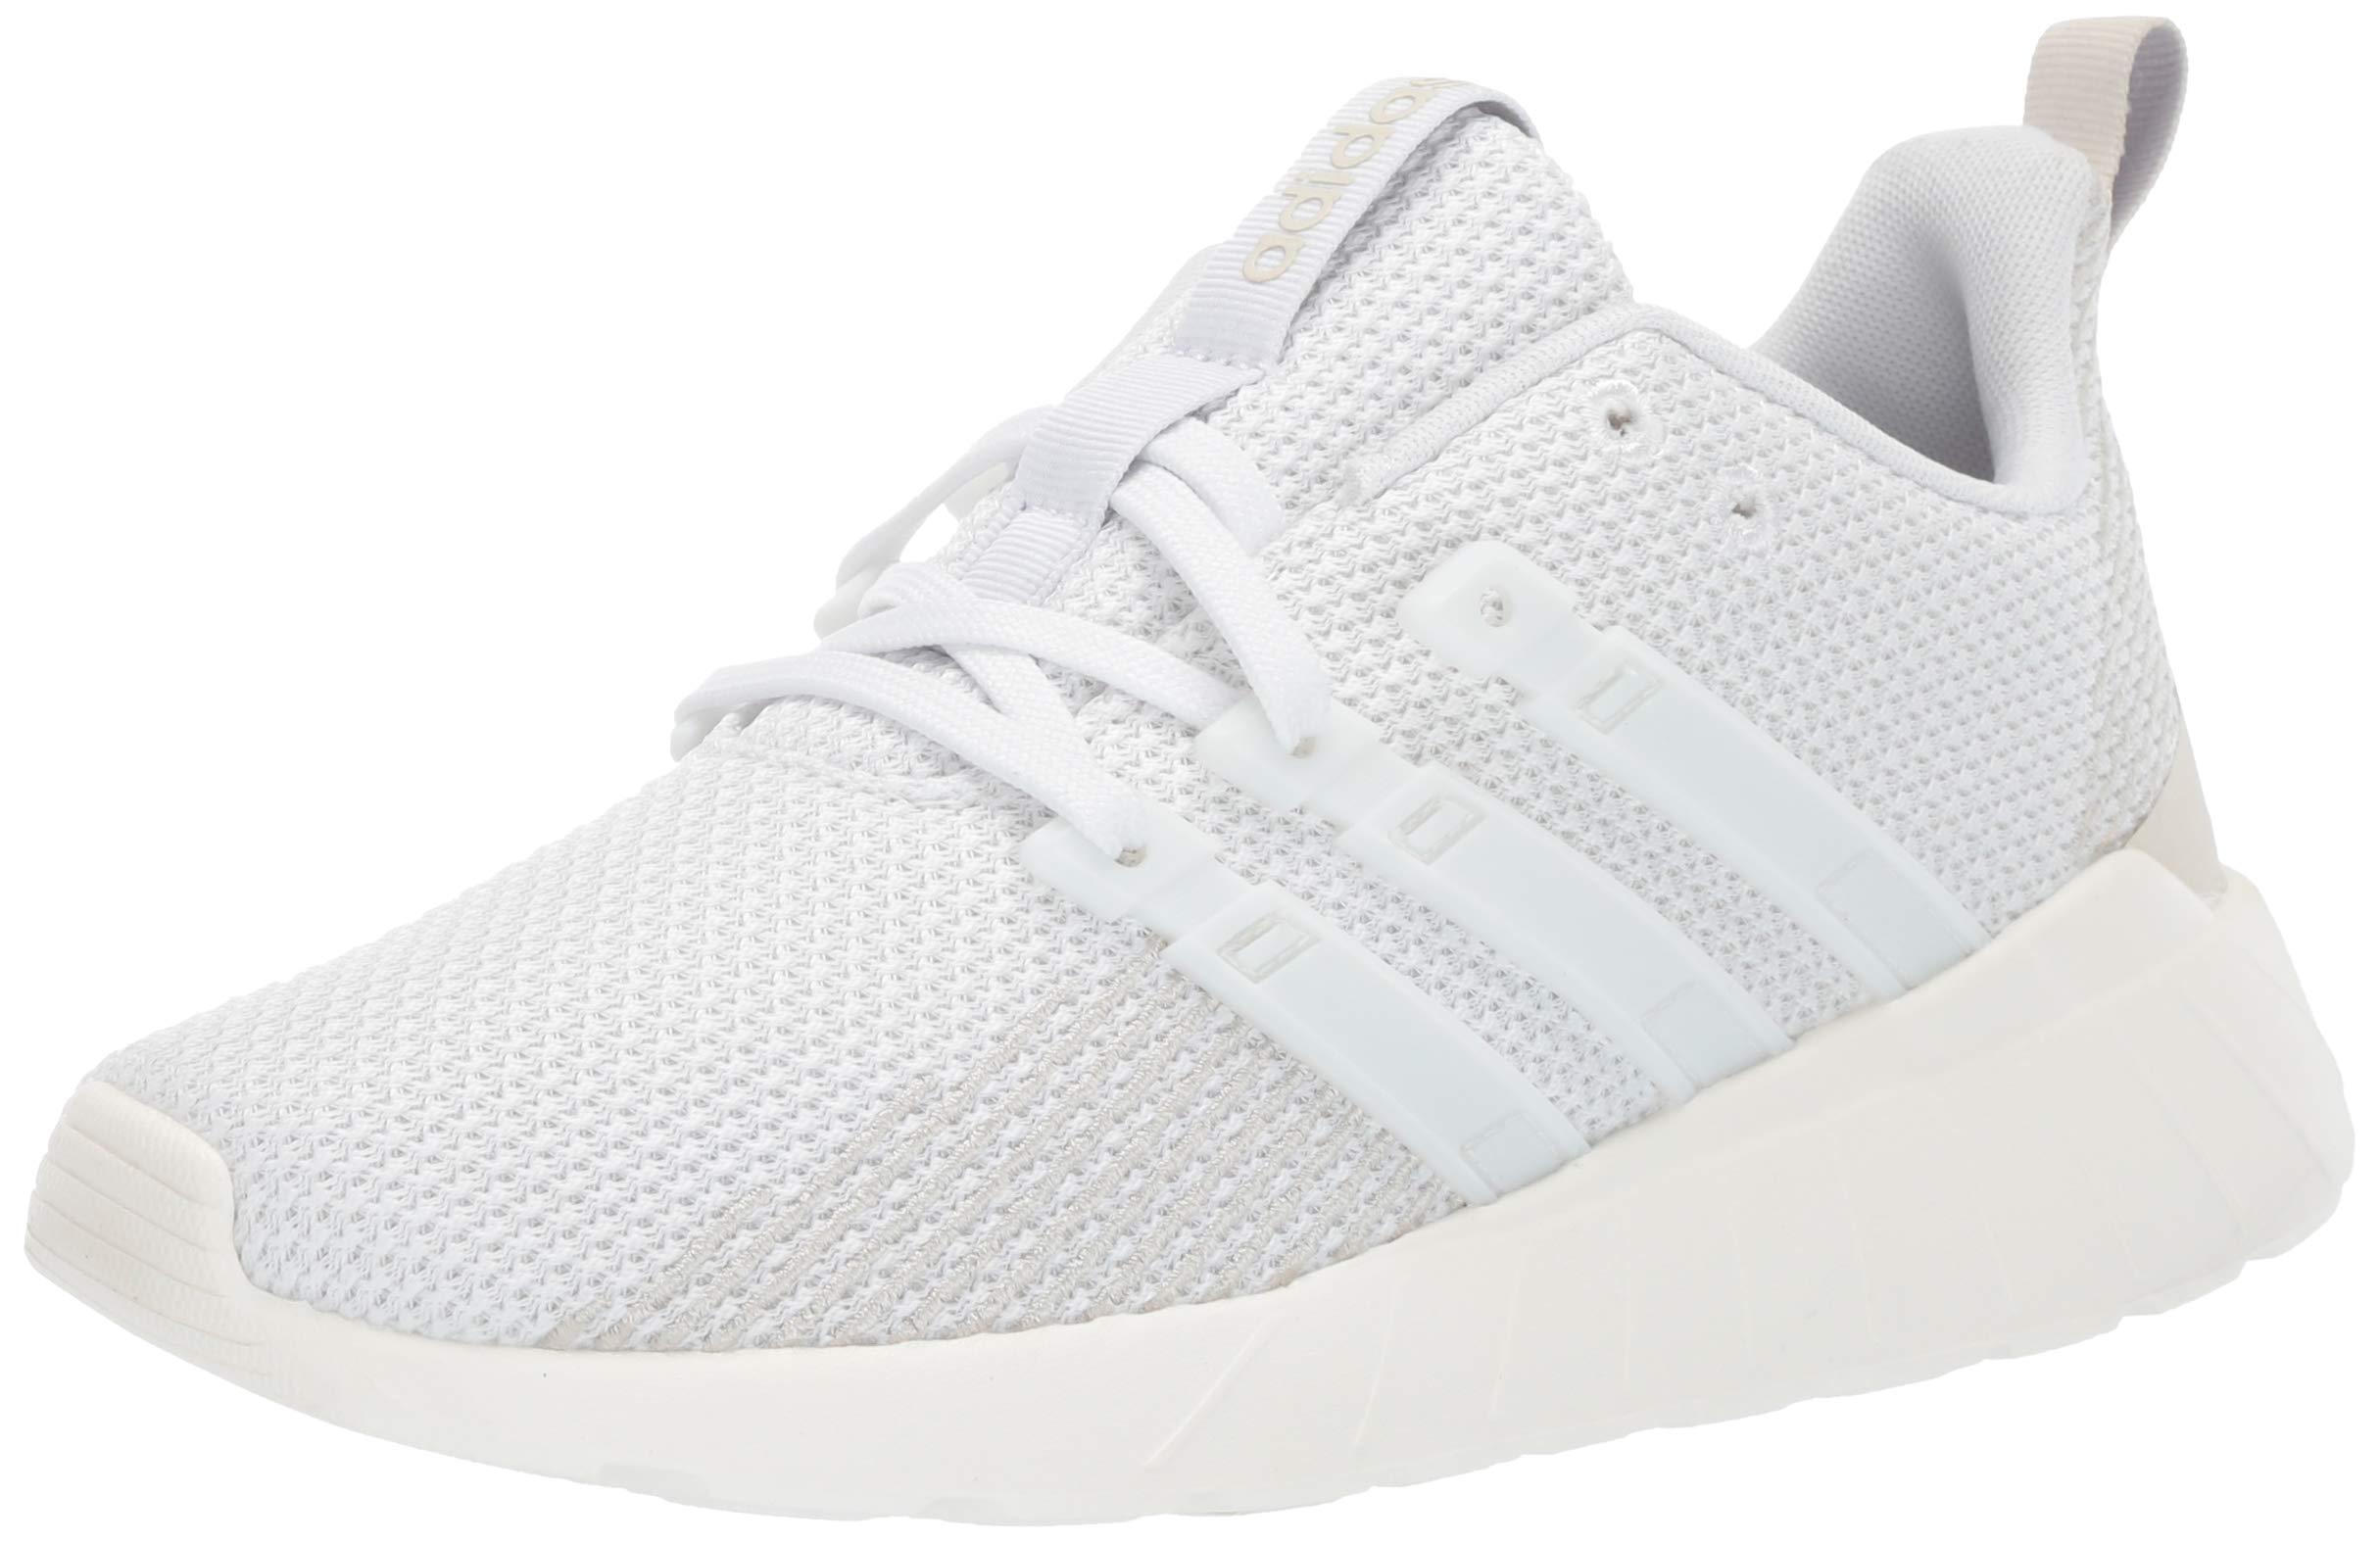 adidas Unisex Questar Flow, white/white/raw white, 1.5 M US Little Kid